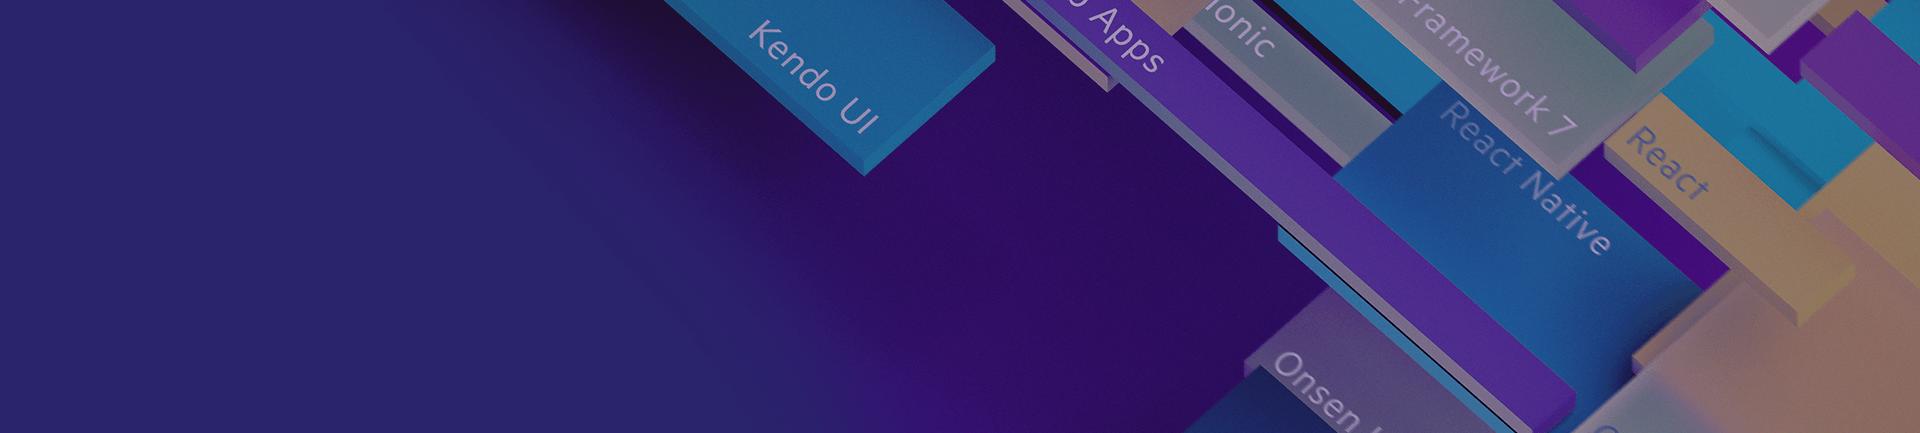 New_Mobile_Dev_Ebook_LP_Banner